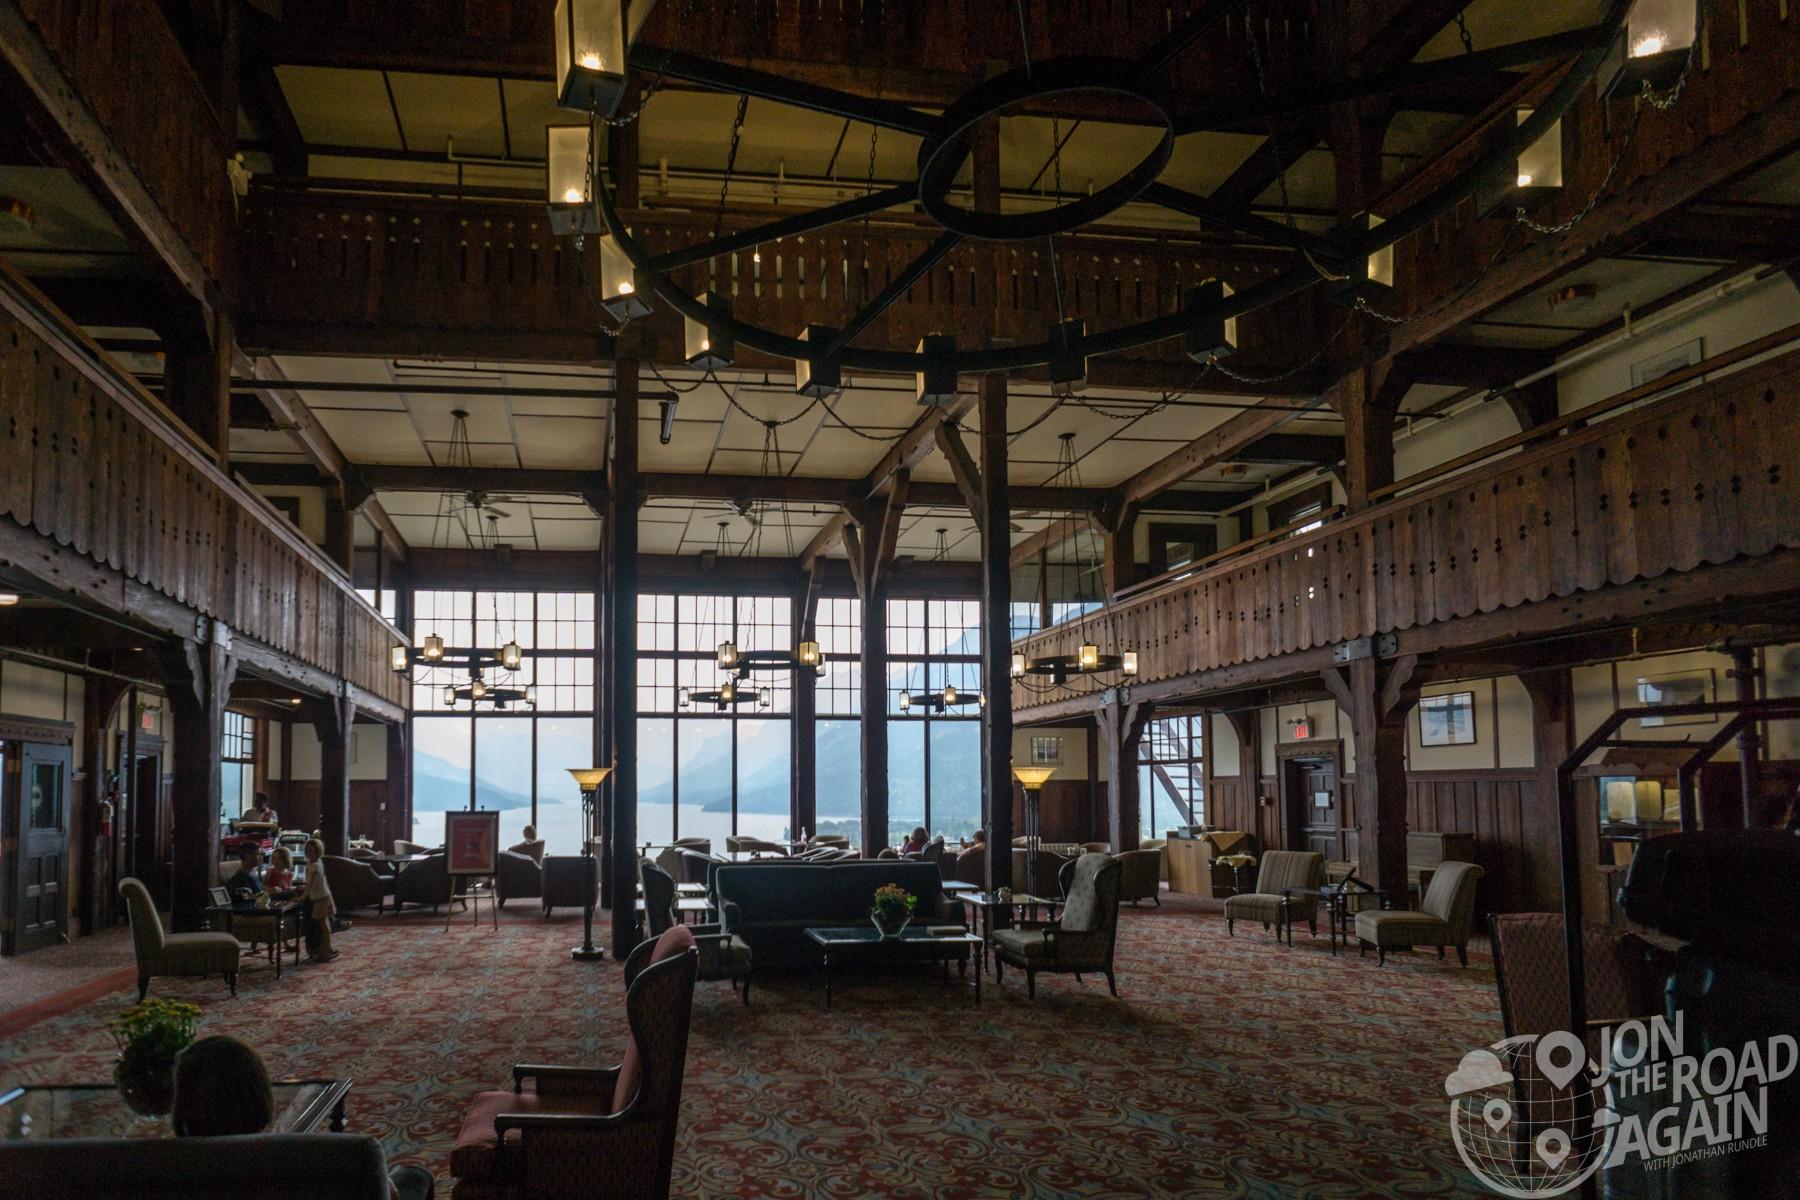 Prince of Wales Hotel, Waterton Lakes, Alberta, Canada